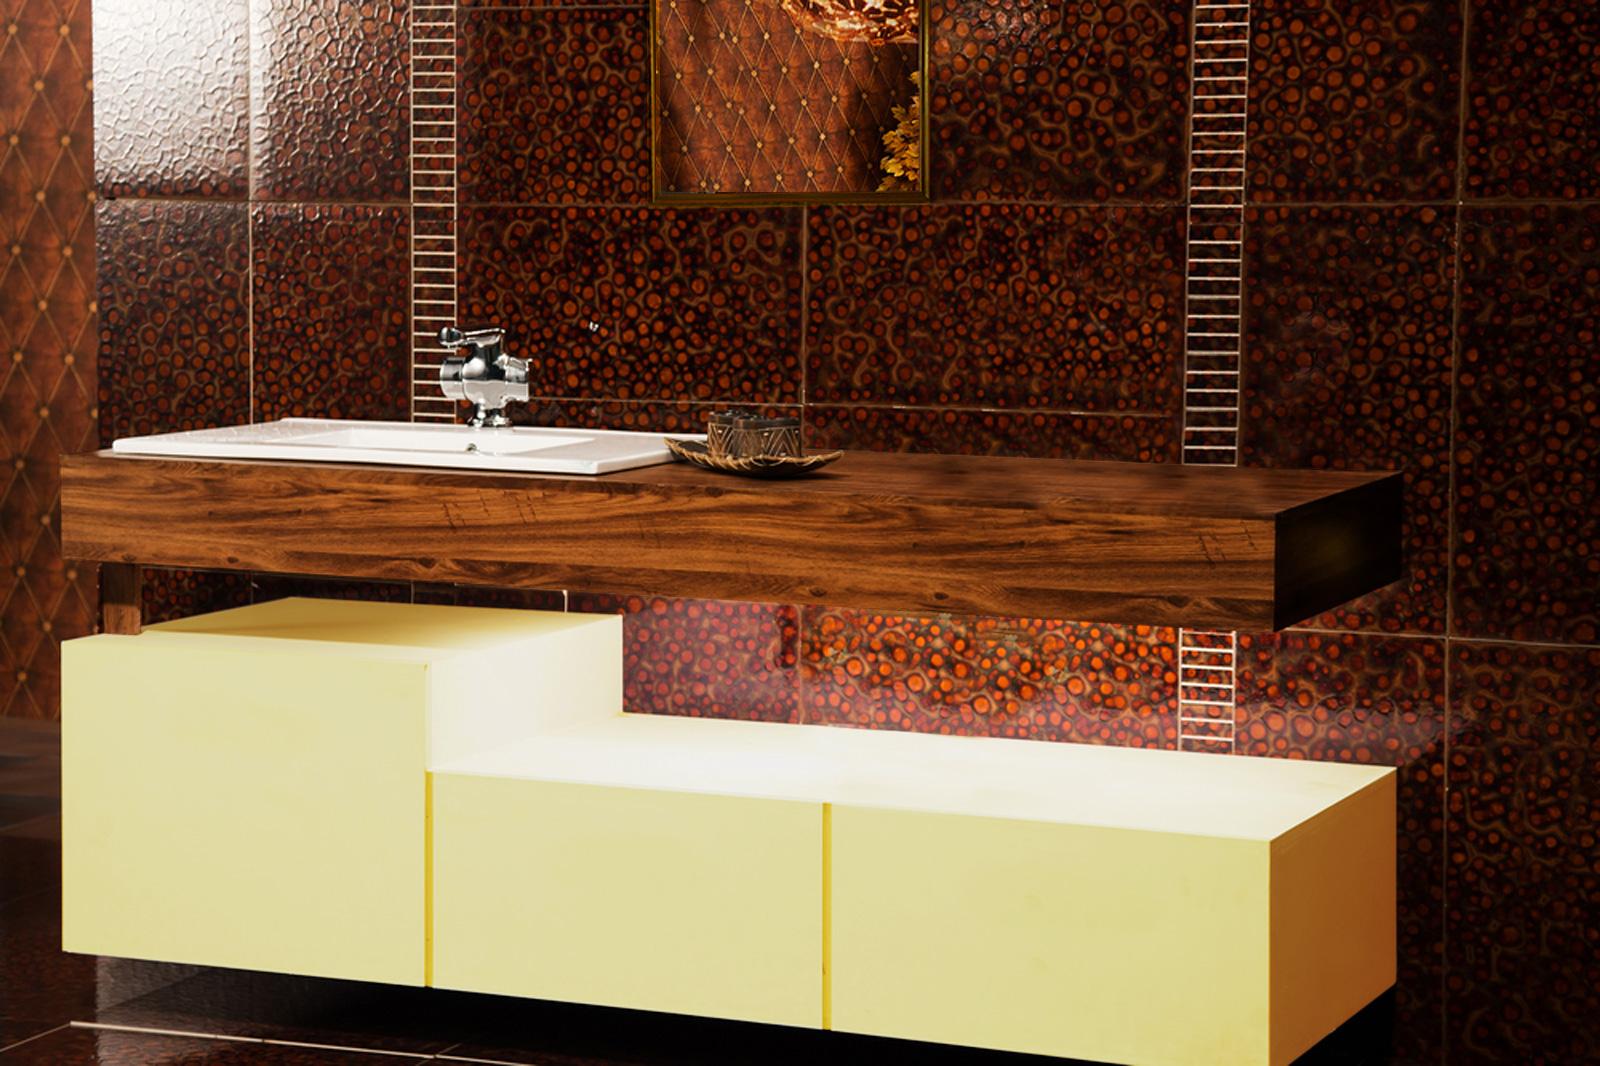 salle de bain orange et bois. Black Bedroom Furniture Sets. Home Design Ideas